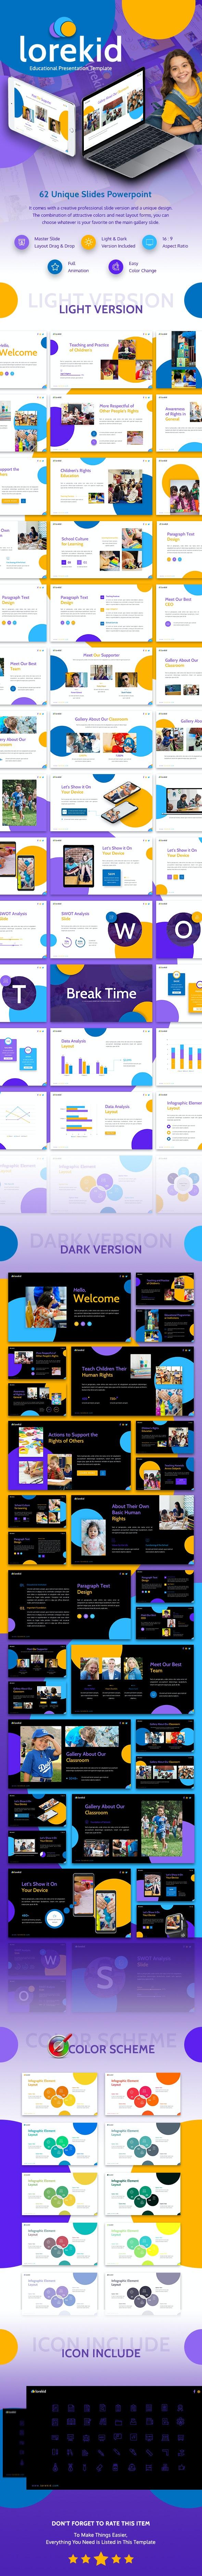 Lorekid Educational Presentation Template - Creative PowerPoint Templates